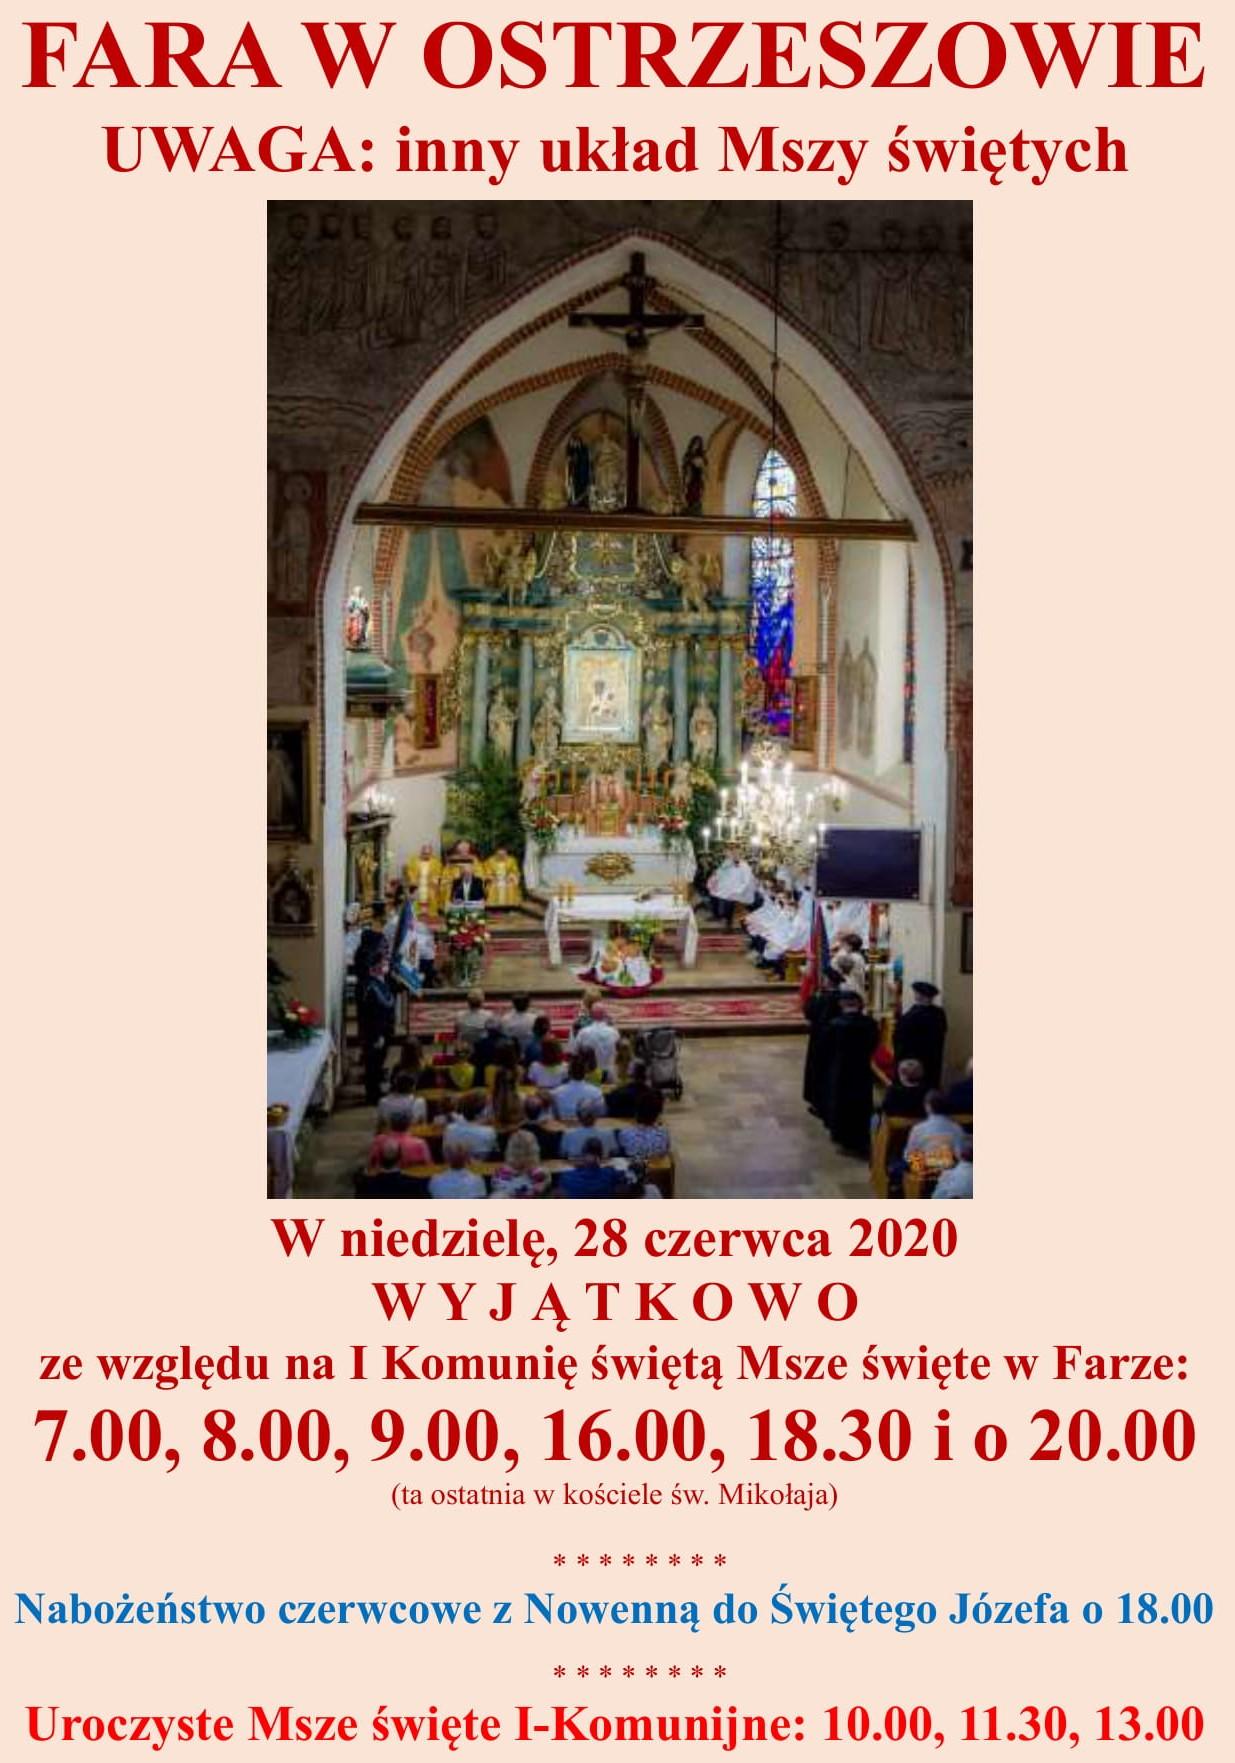 Katolicki portal randkowy dla seniorw - mcemergencyservices.org